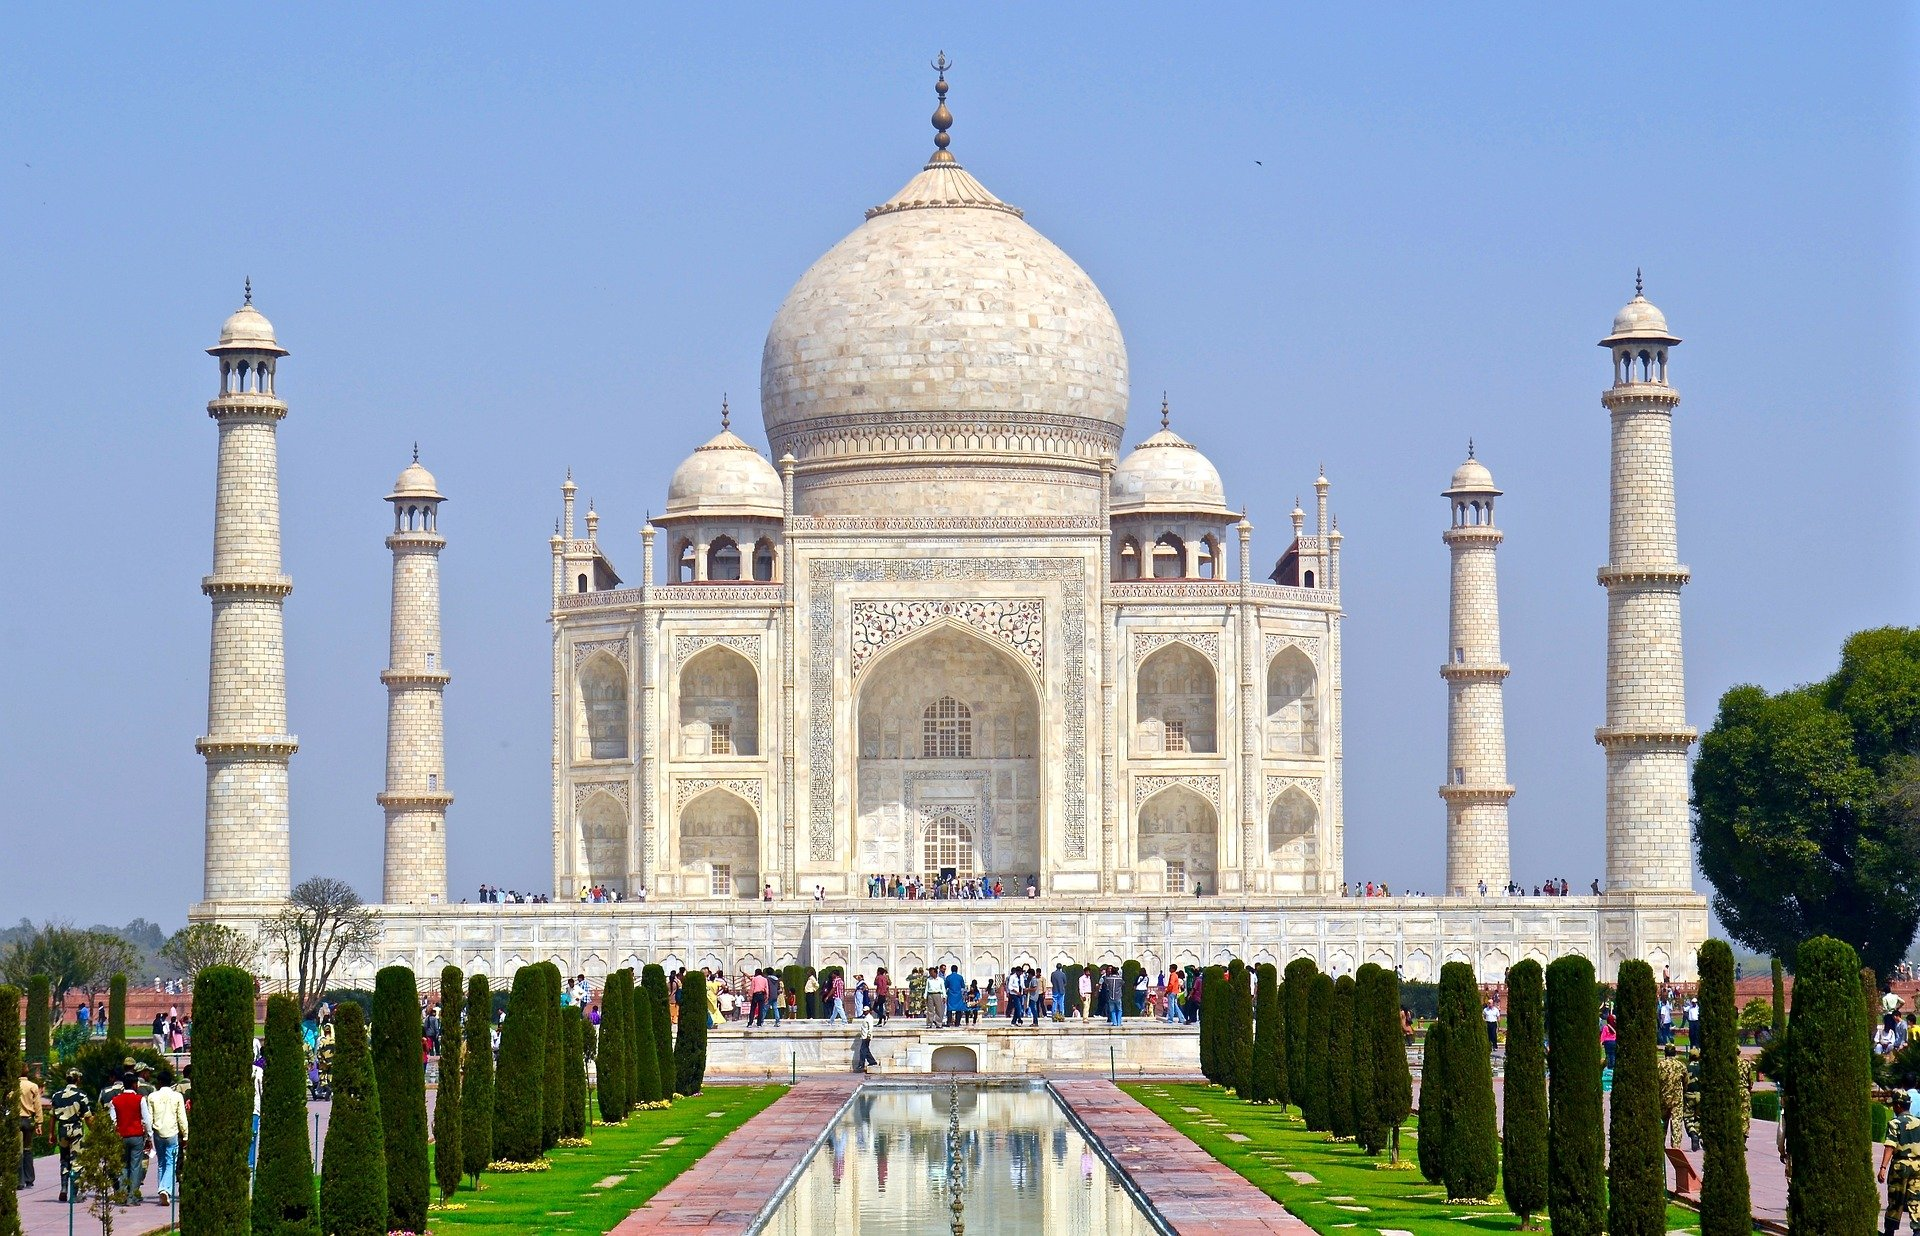 Marvel at the architecture of Taj Mahal